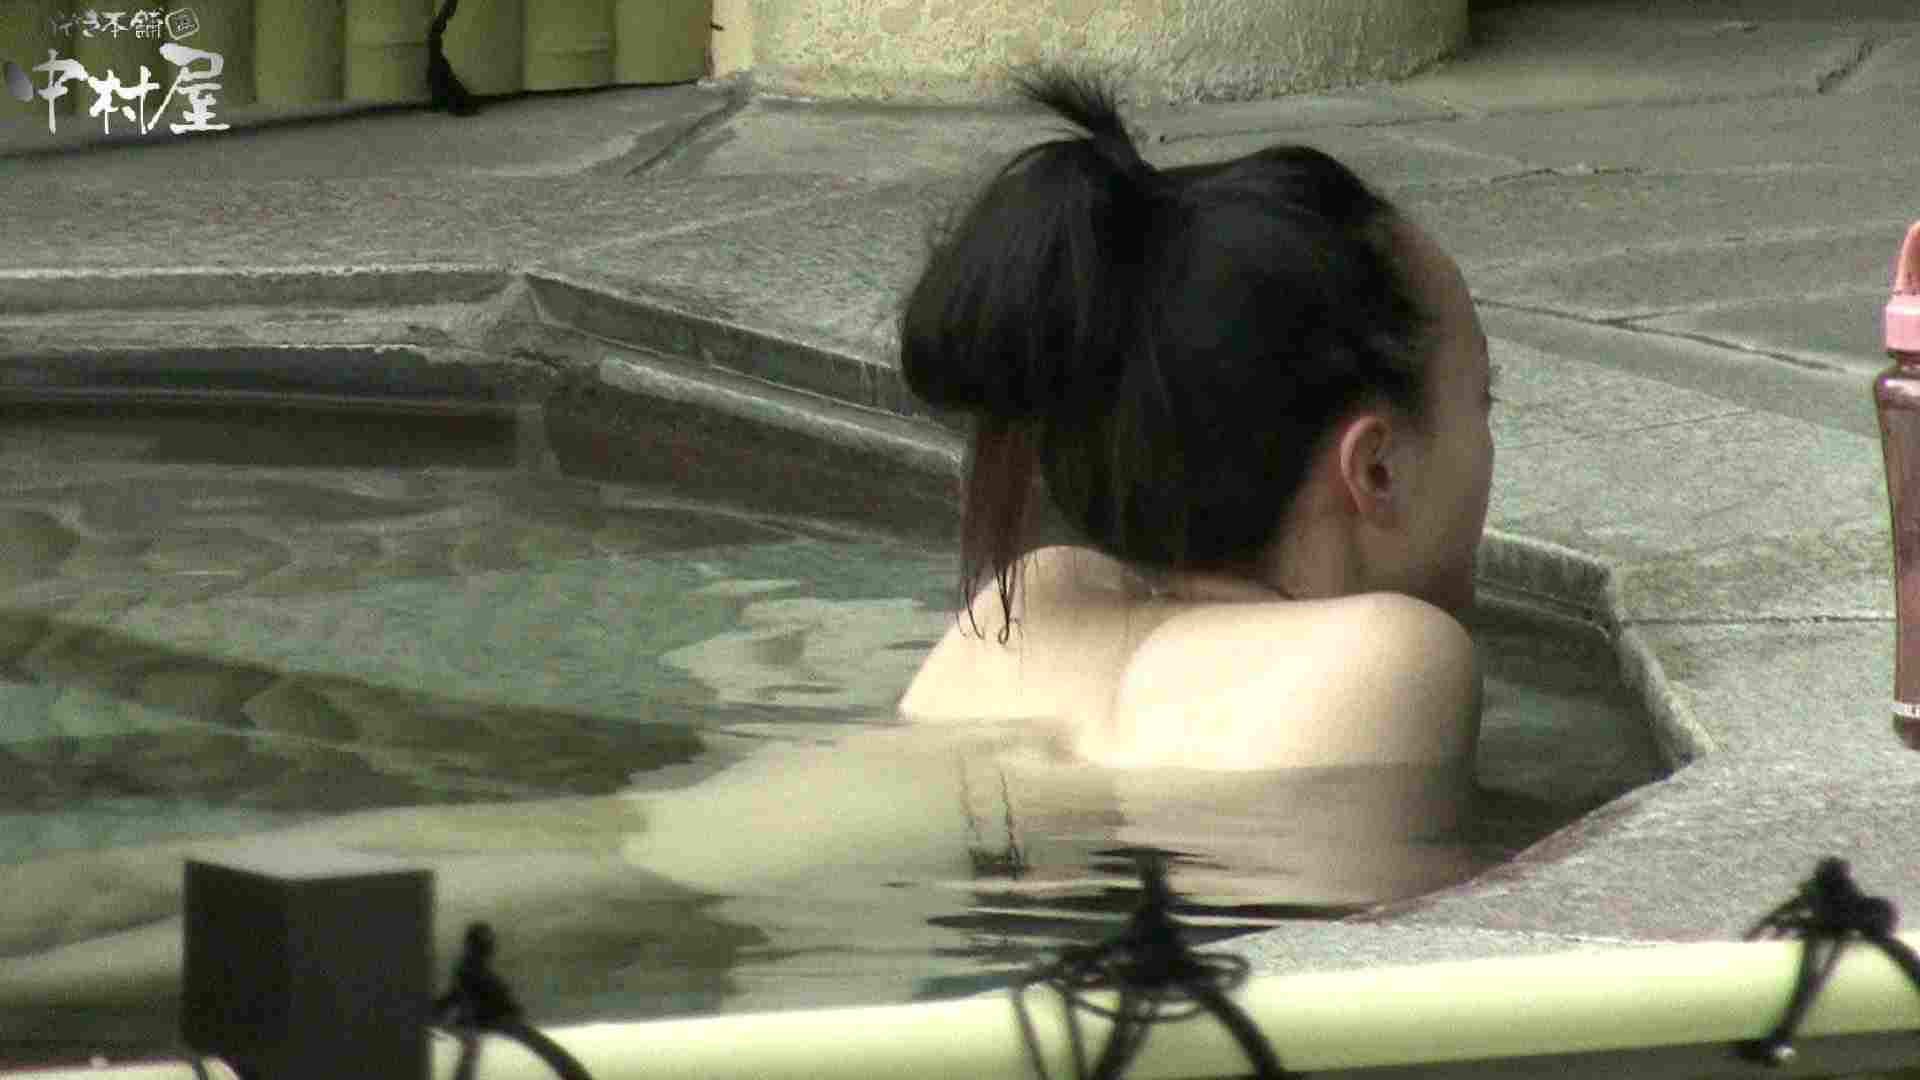 Aquaな露天風呂Vol.900 盗撮師作品 ヌード画像 86pic 38